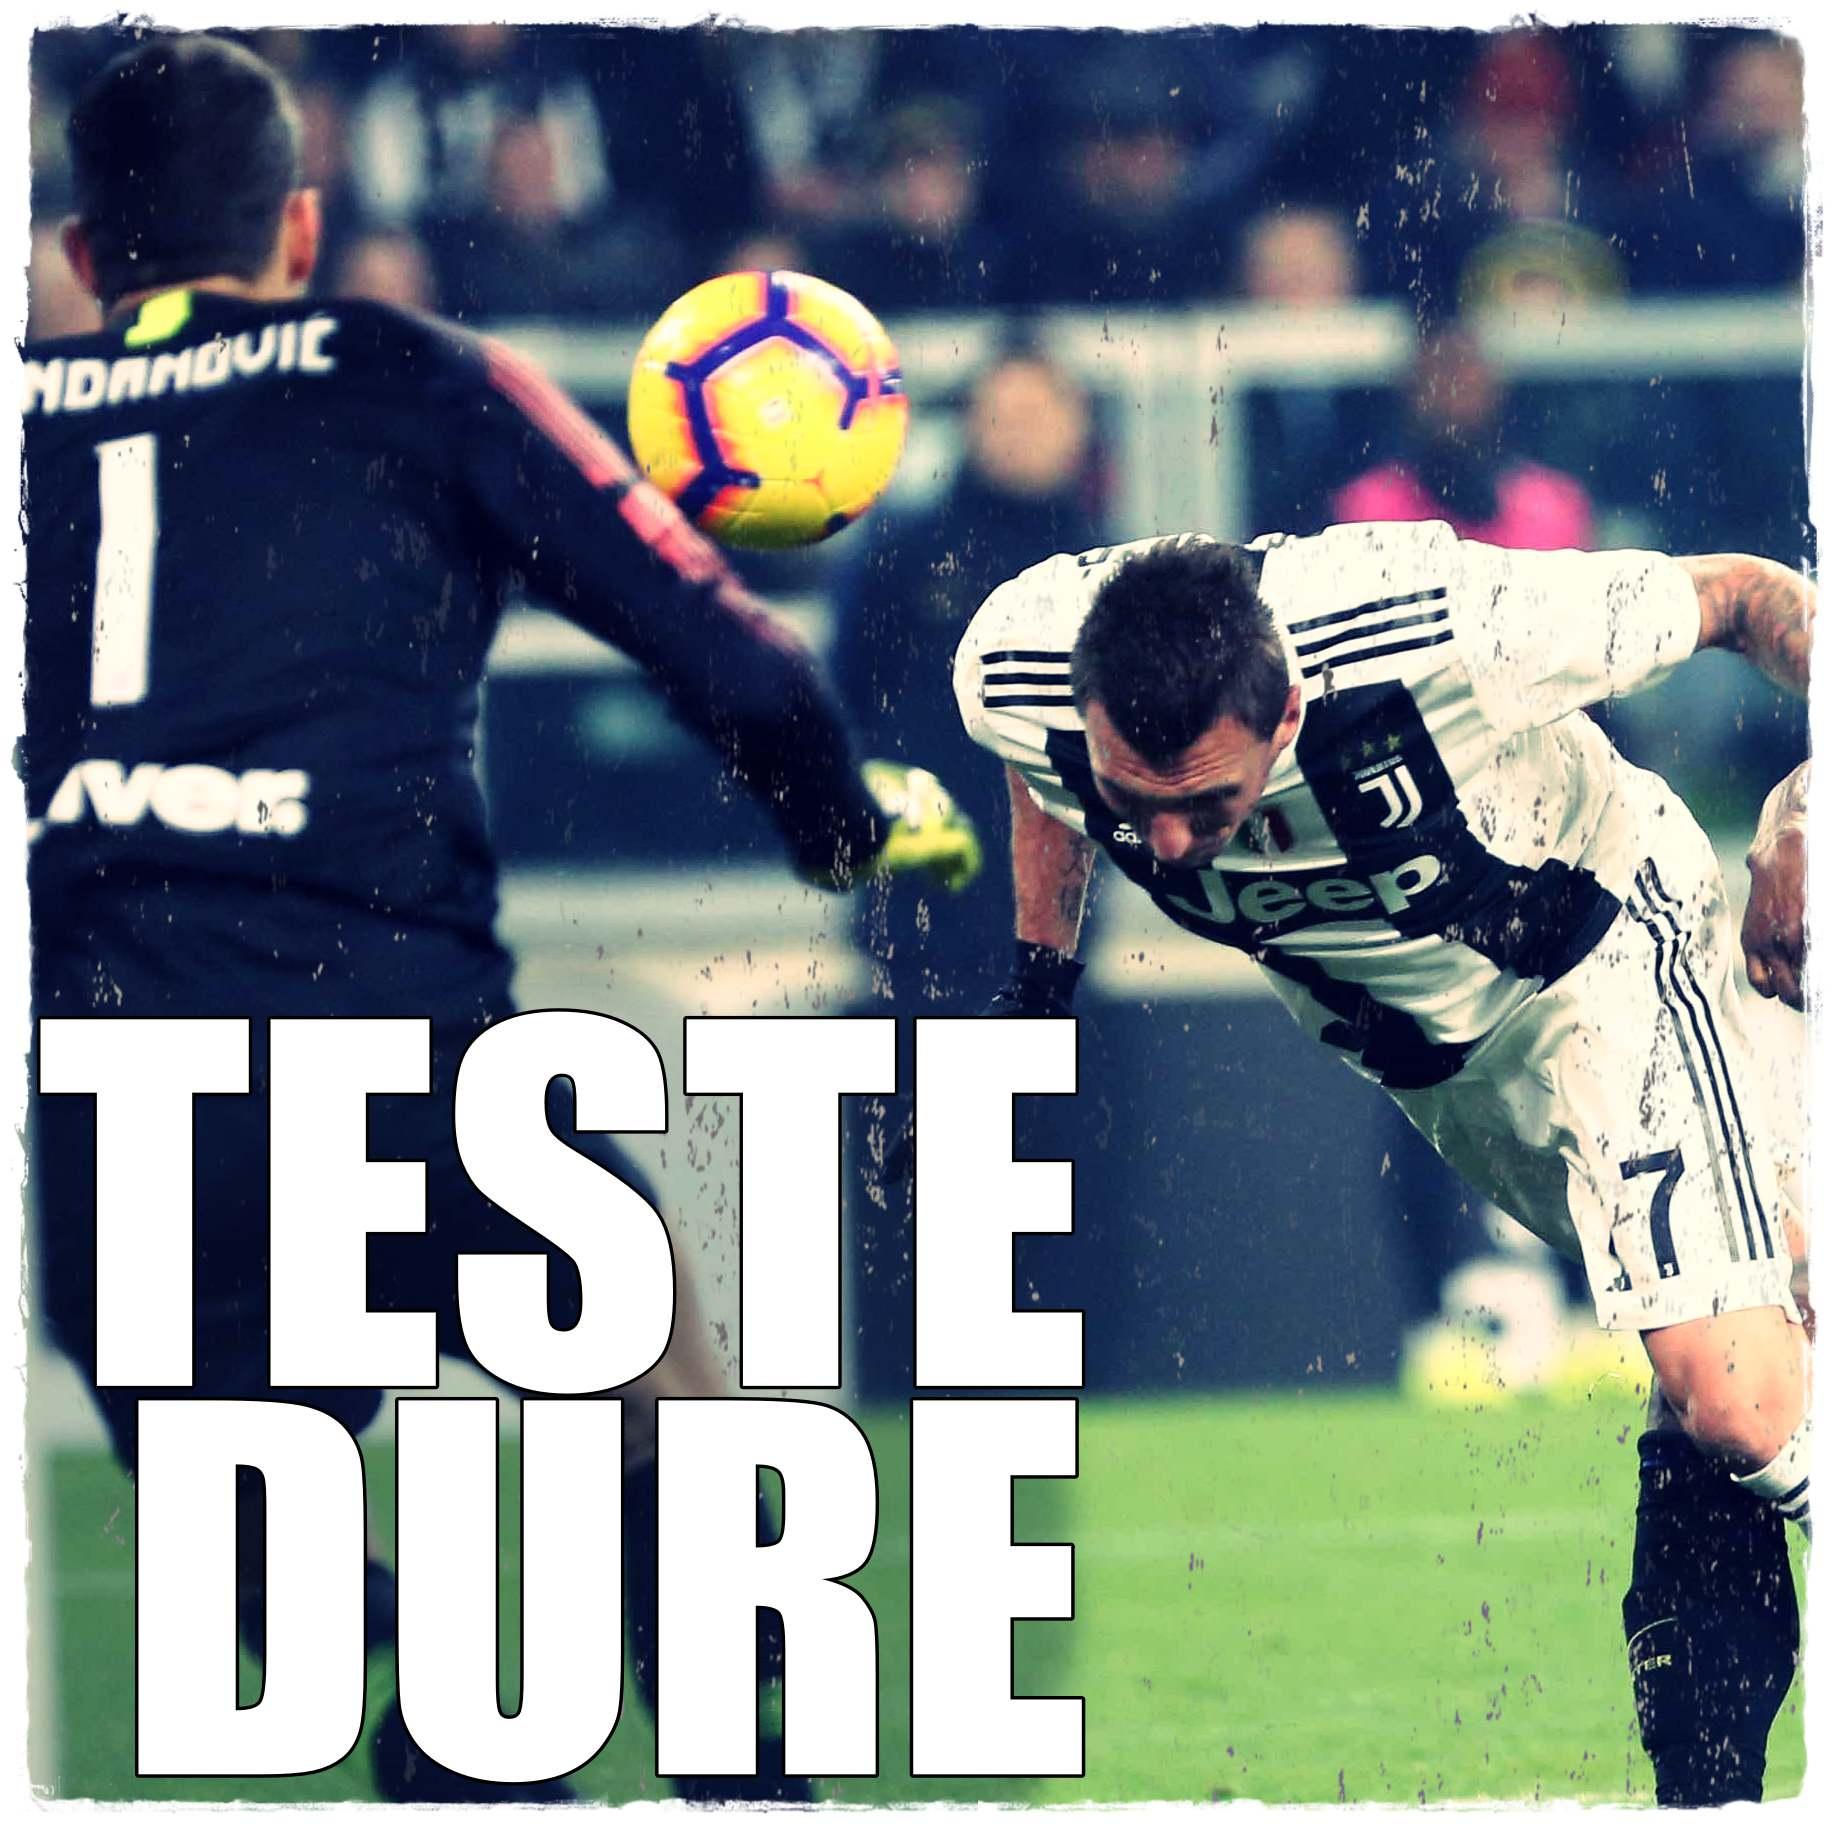 Mandzukic Juve Inter